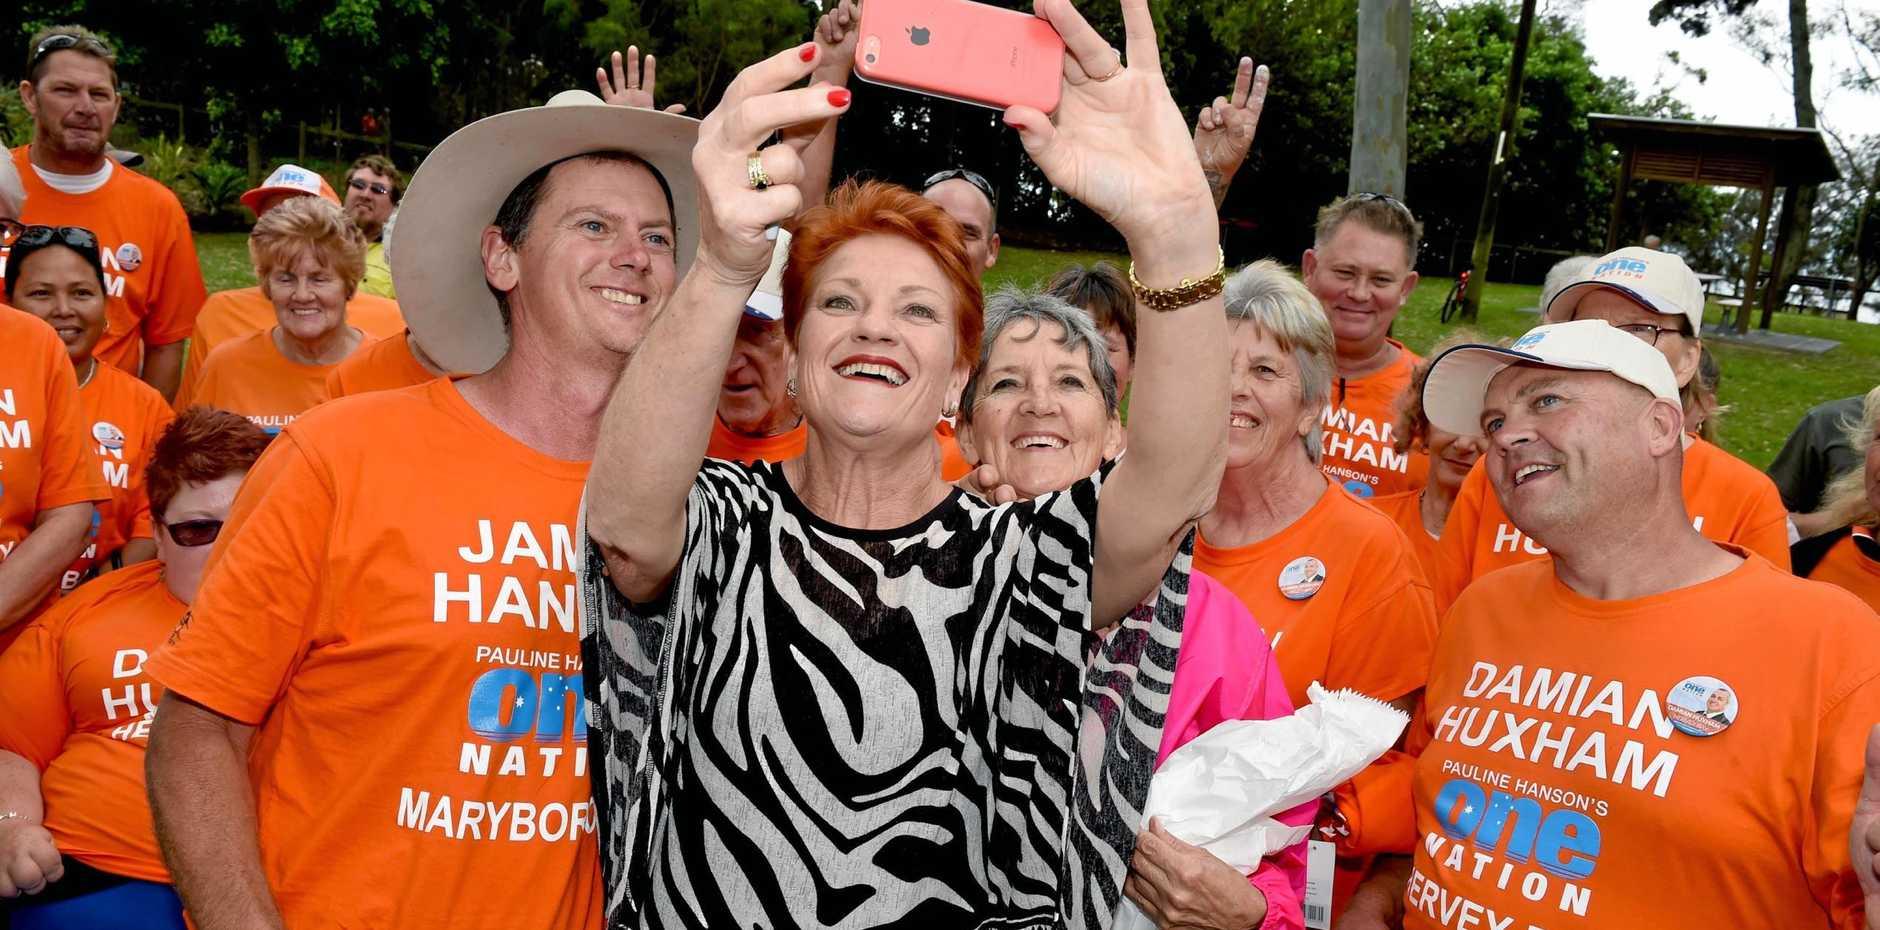 Pauline Hanson and her candidates, Damian Huxham and James Hansen in Hervey Bay.